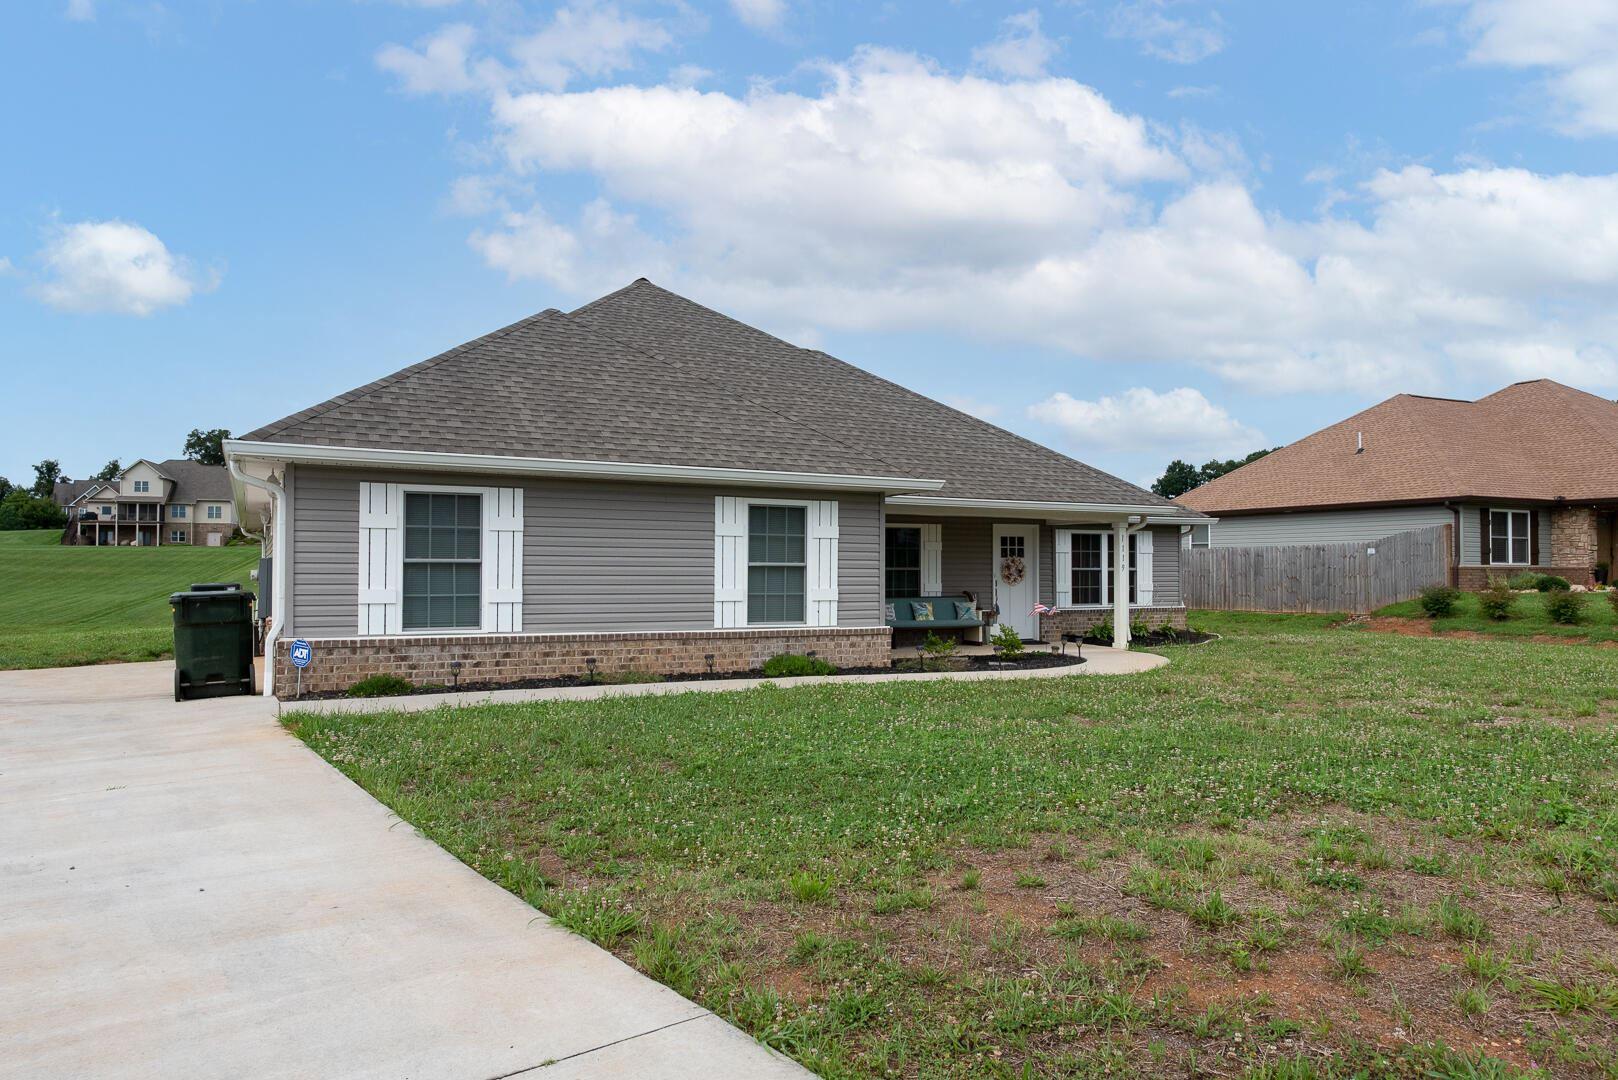 Photo of 1119 Walker Rd, Maryville, TN 37801 (MLS # 1160531)